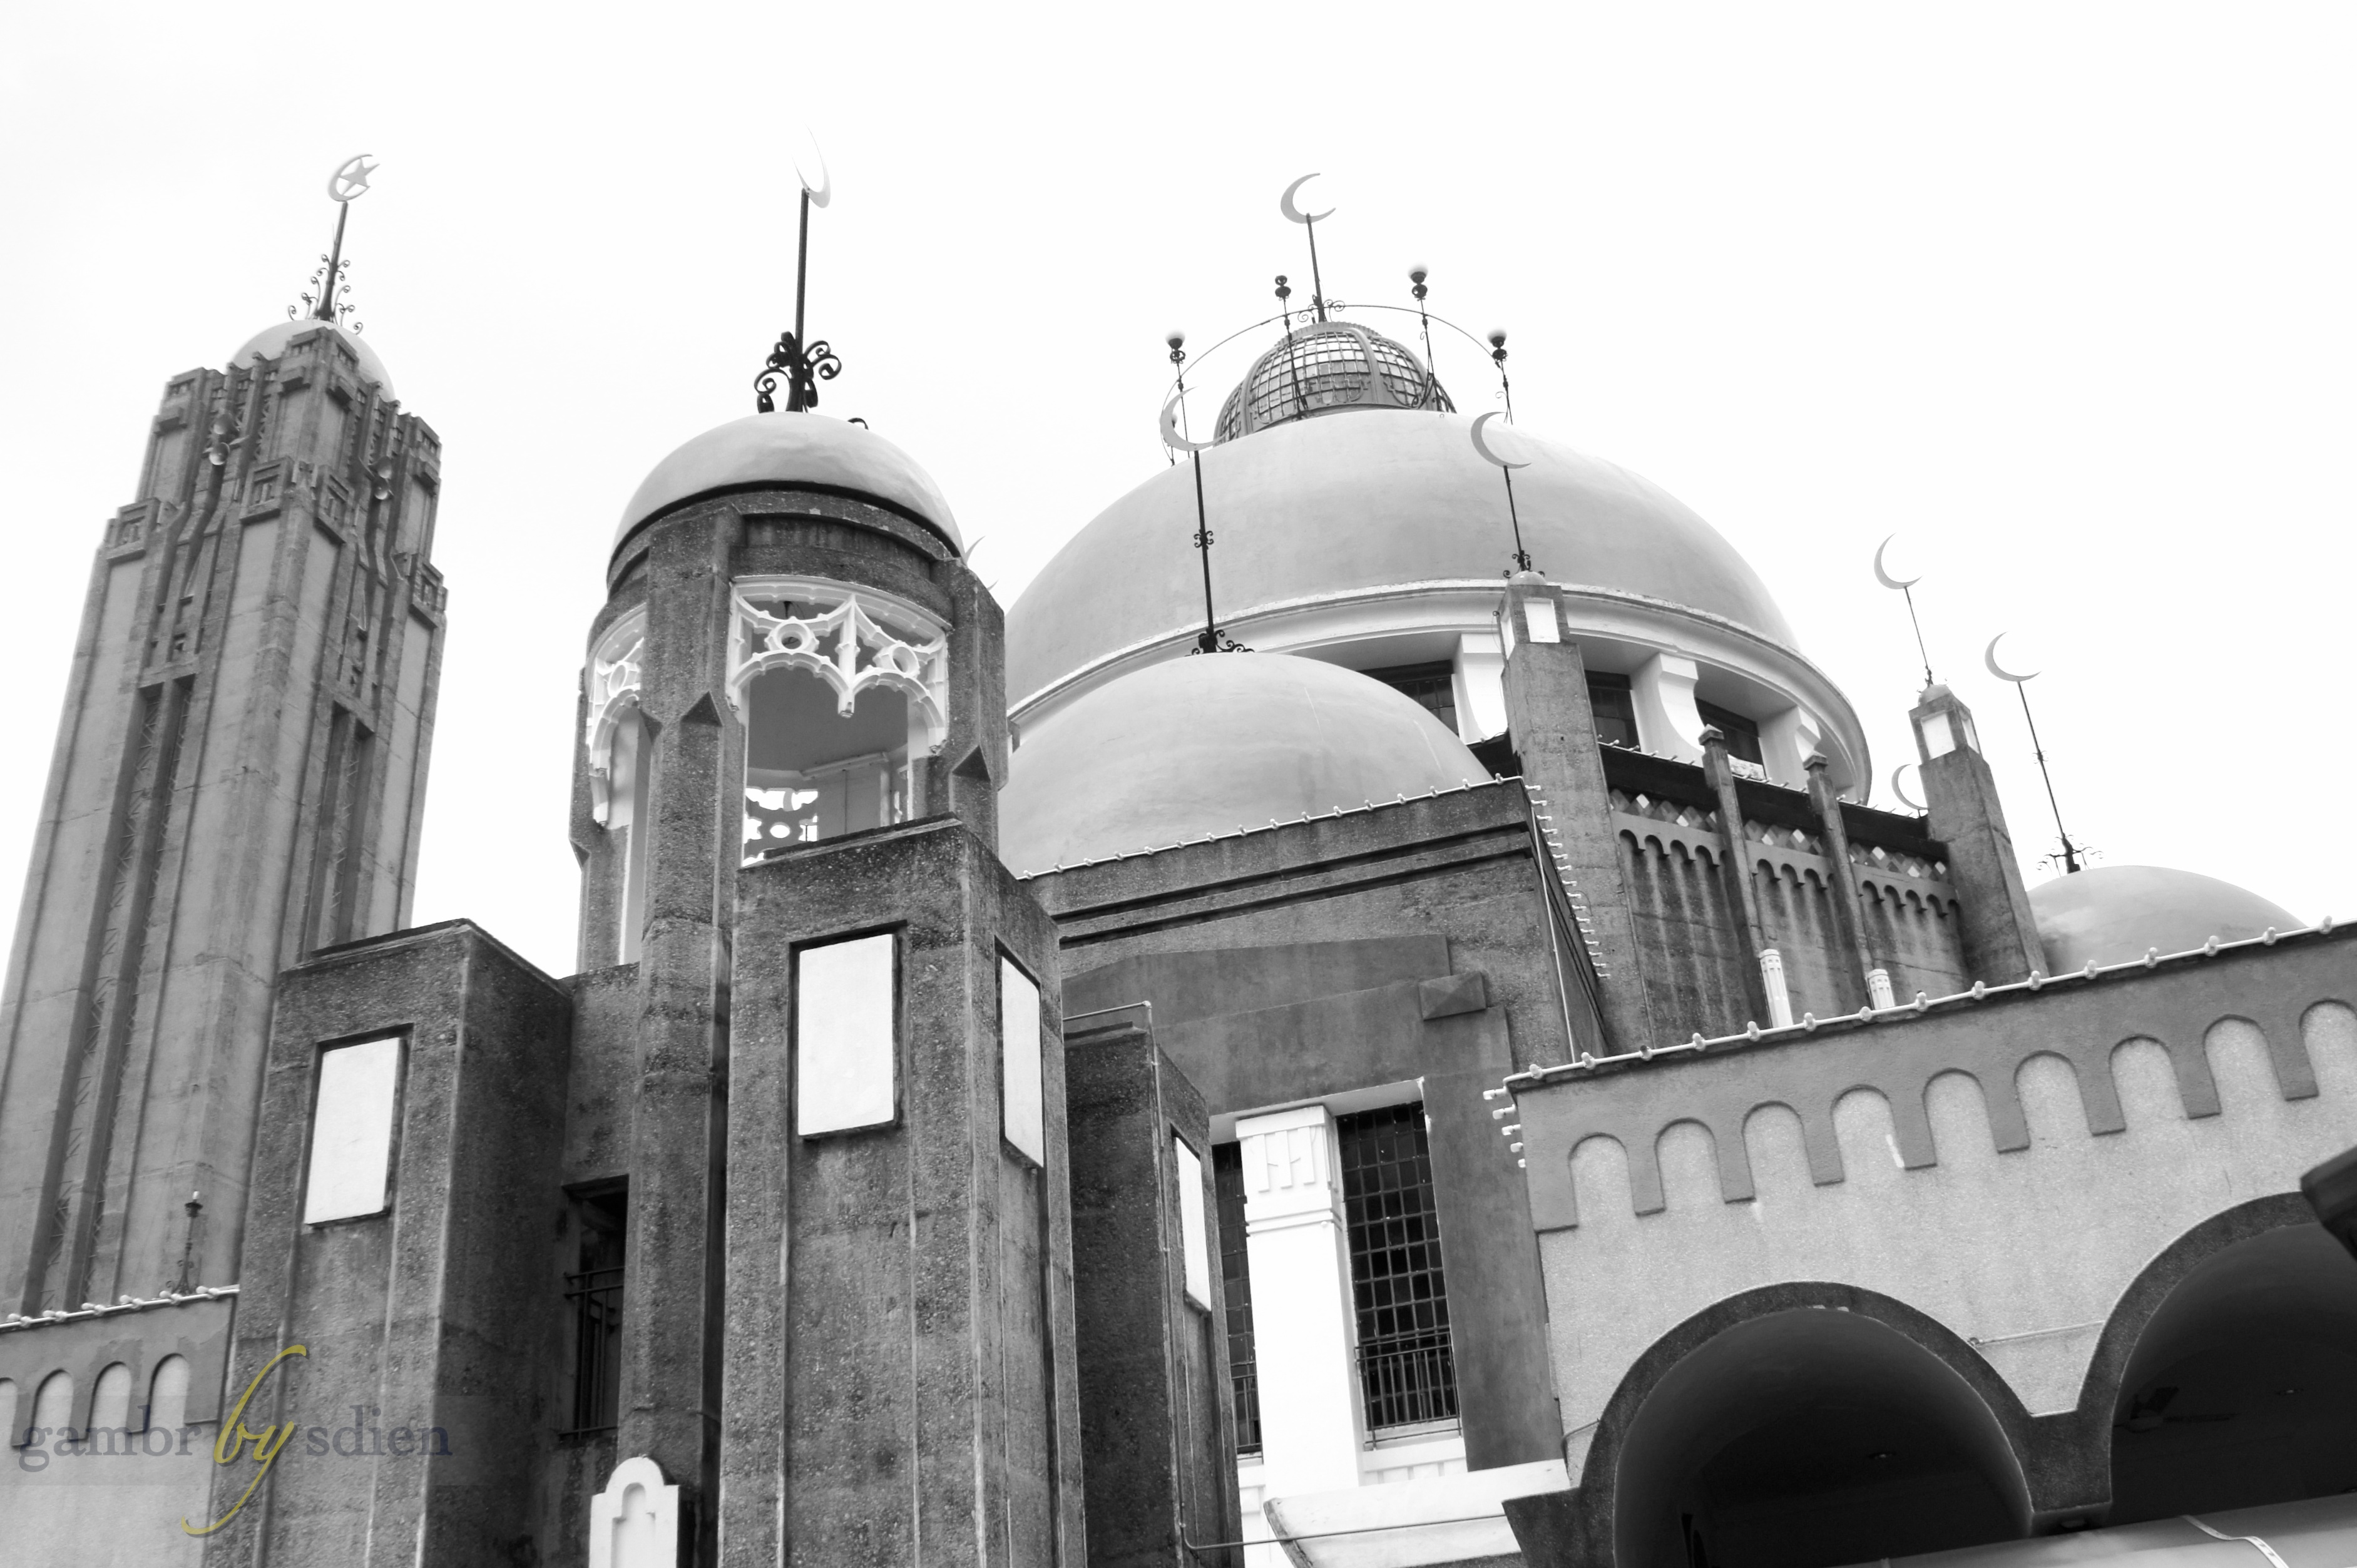 Masjid Sultan Sulaiman Klang Gambr Kawe Tengok Kawe Napok Kawe Ambik